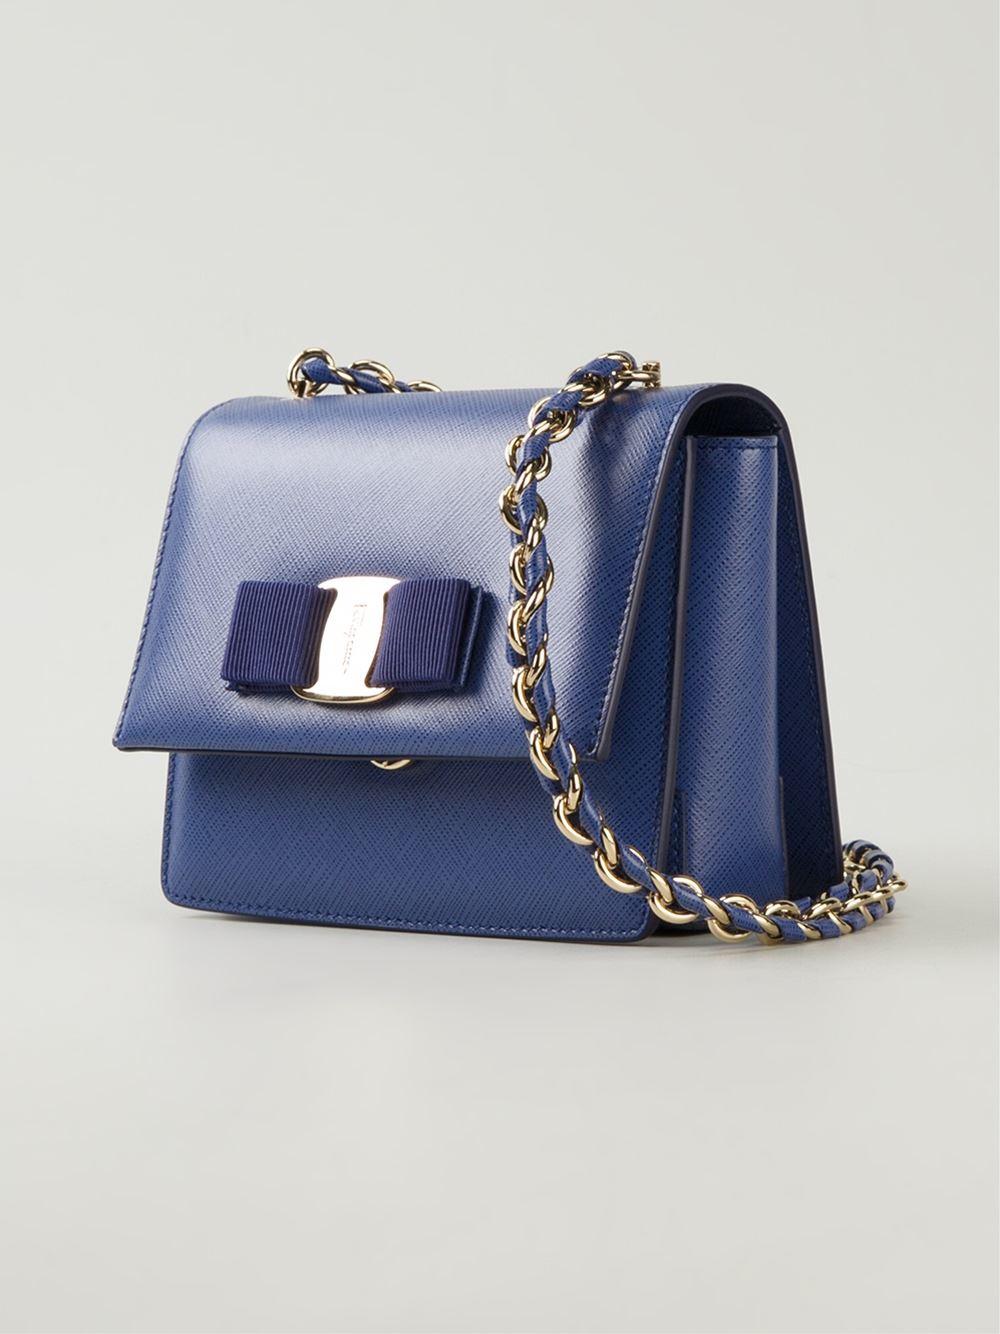 Ferragamo  Ginny  Cross Body Bag in Blue - Lyst bbb3b0d576